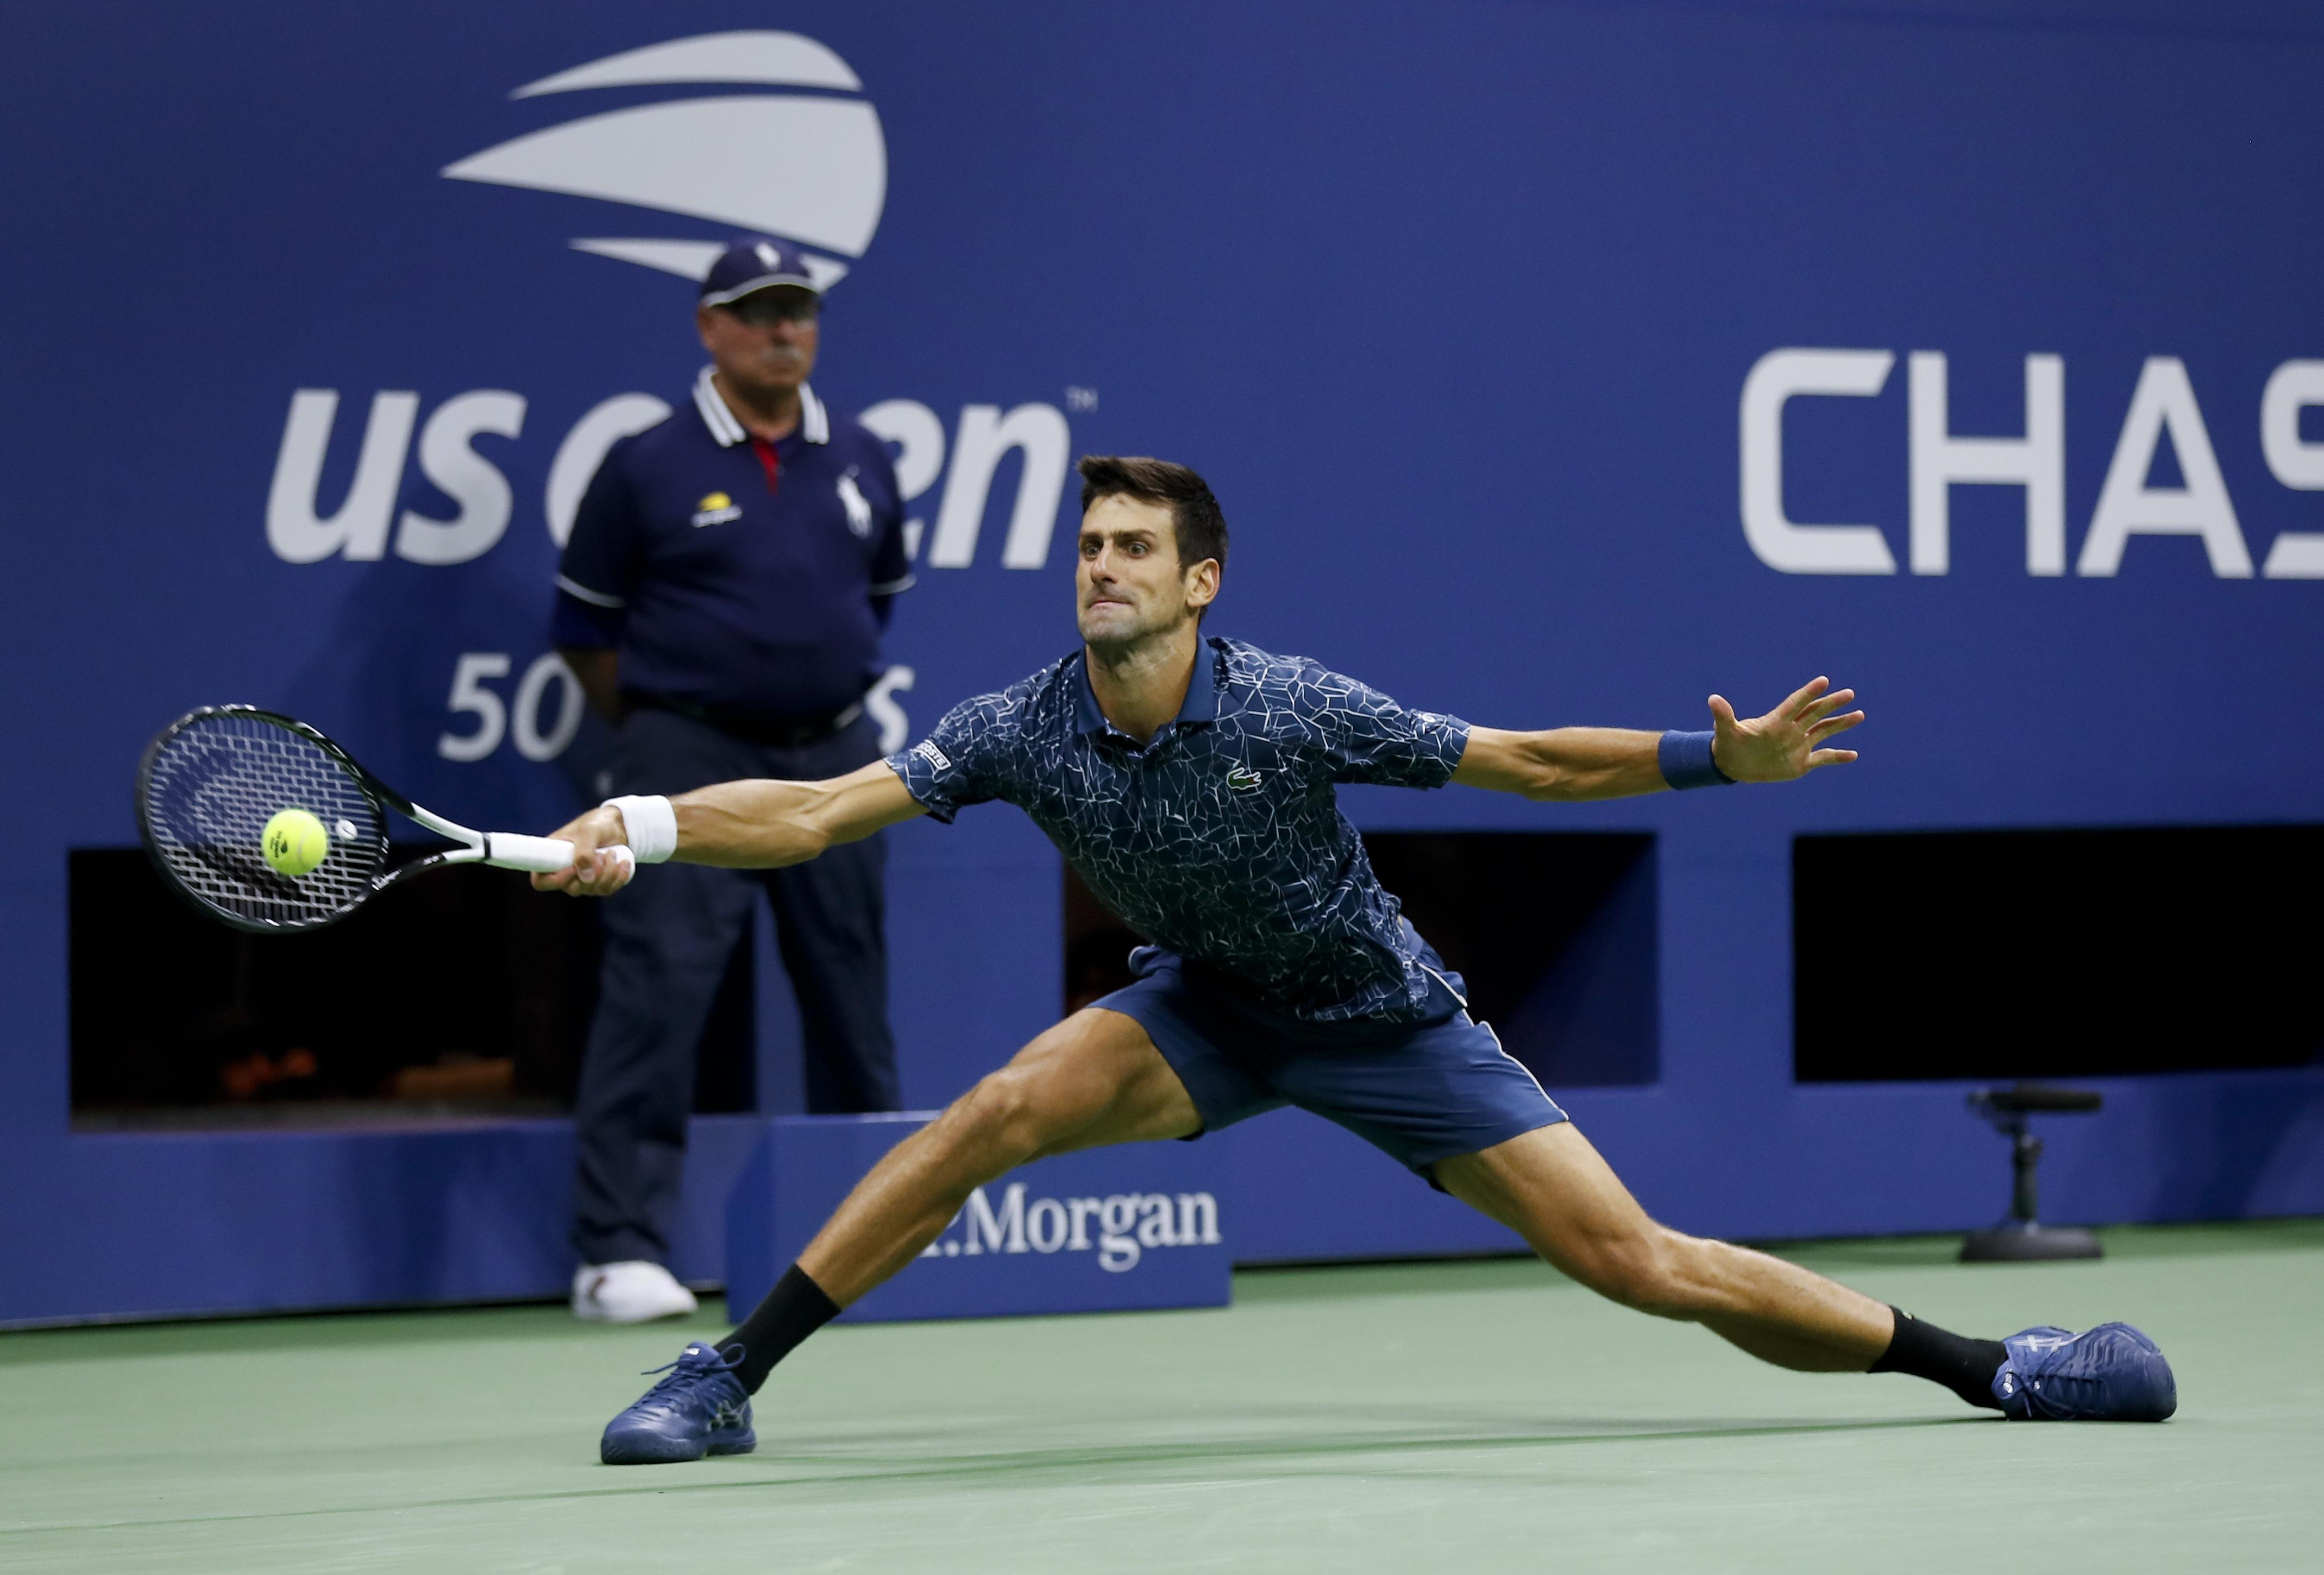 Novak Djokovic returns a shot at full stretch against Juan Martin del Potro